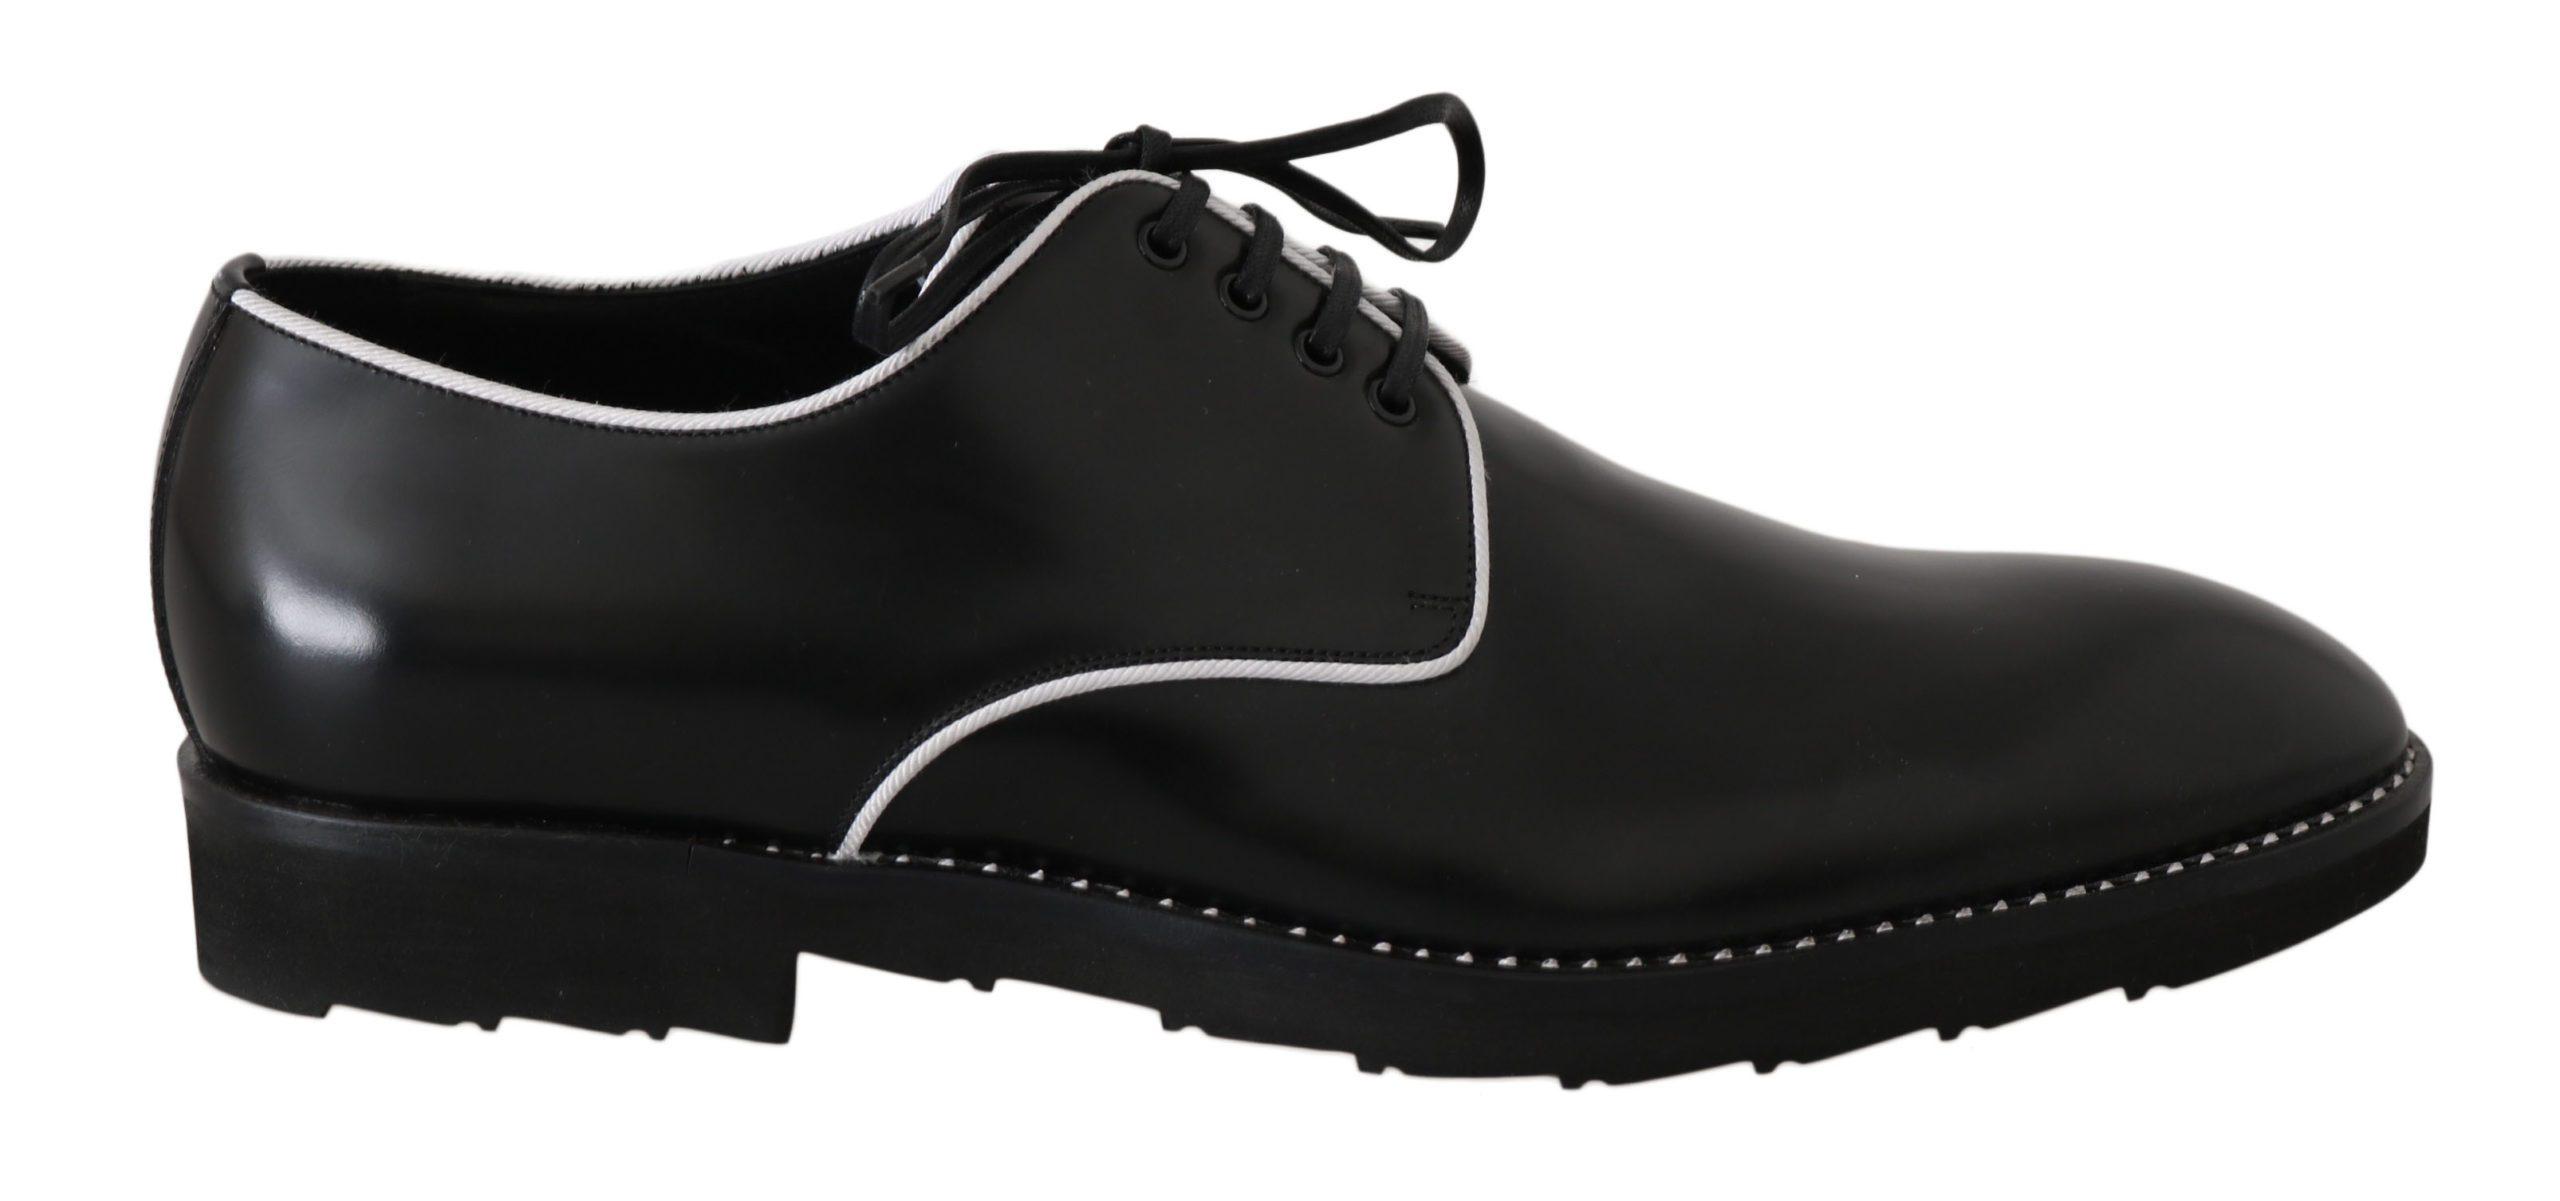 Dolce & Gabbana Men's Leather Line Derby Shoes Black MV2354 - EU39/US6